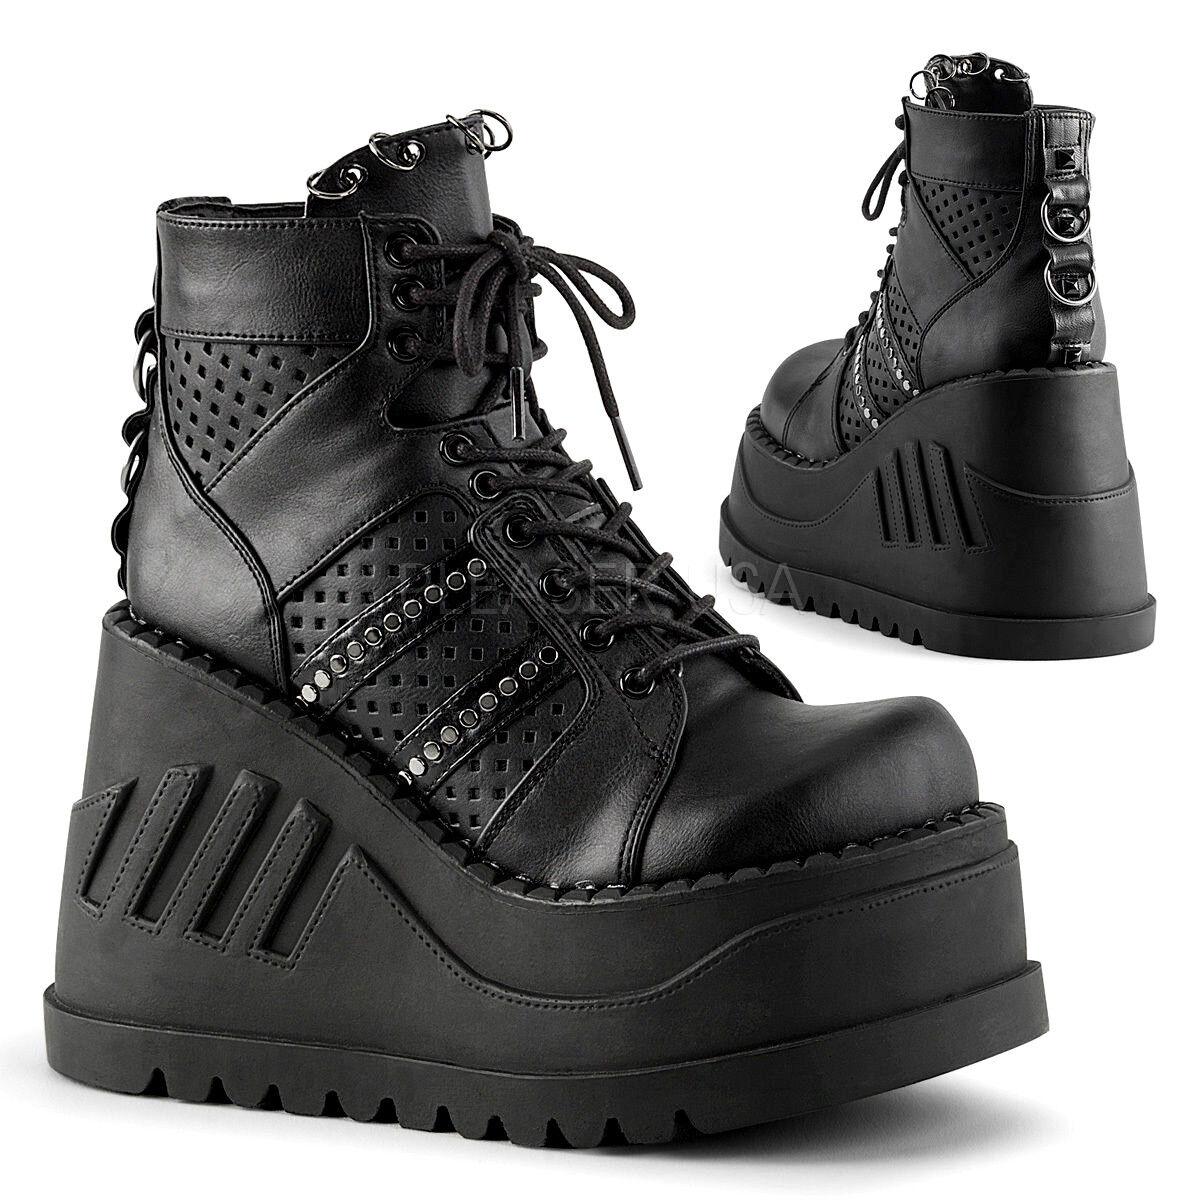 Demonia 4.75  Wedge Platform Black Ankle Boots 6 7 8 9 10 11